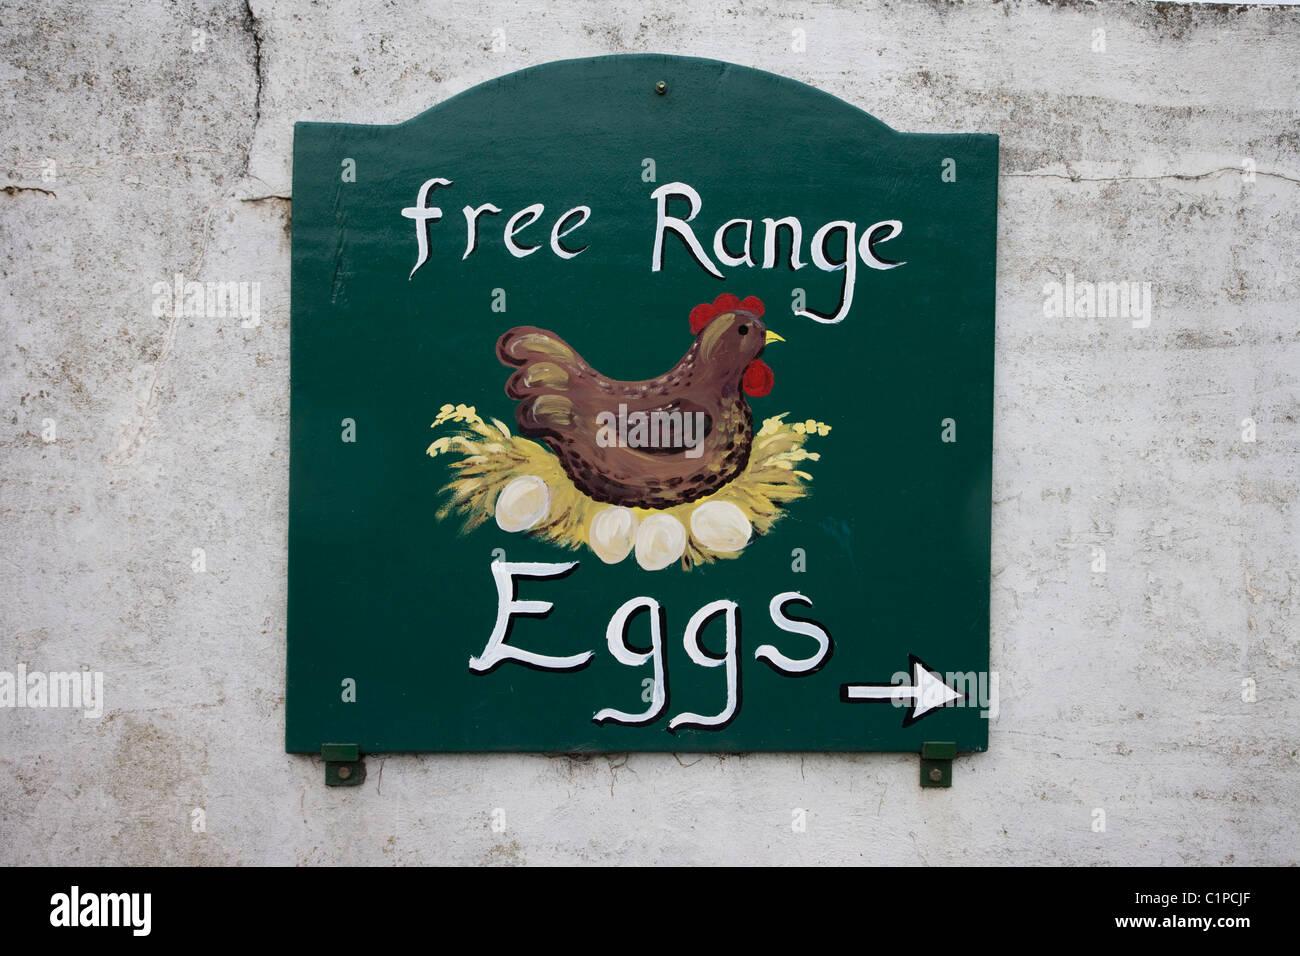 Republic of Ireland, Wicklow, sign for free range eggs - Stock Image